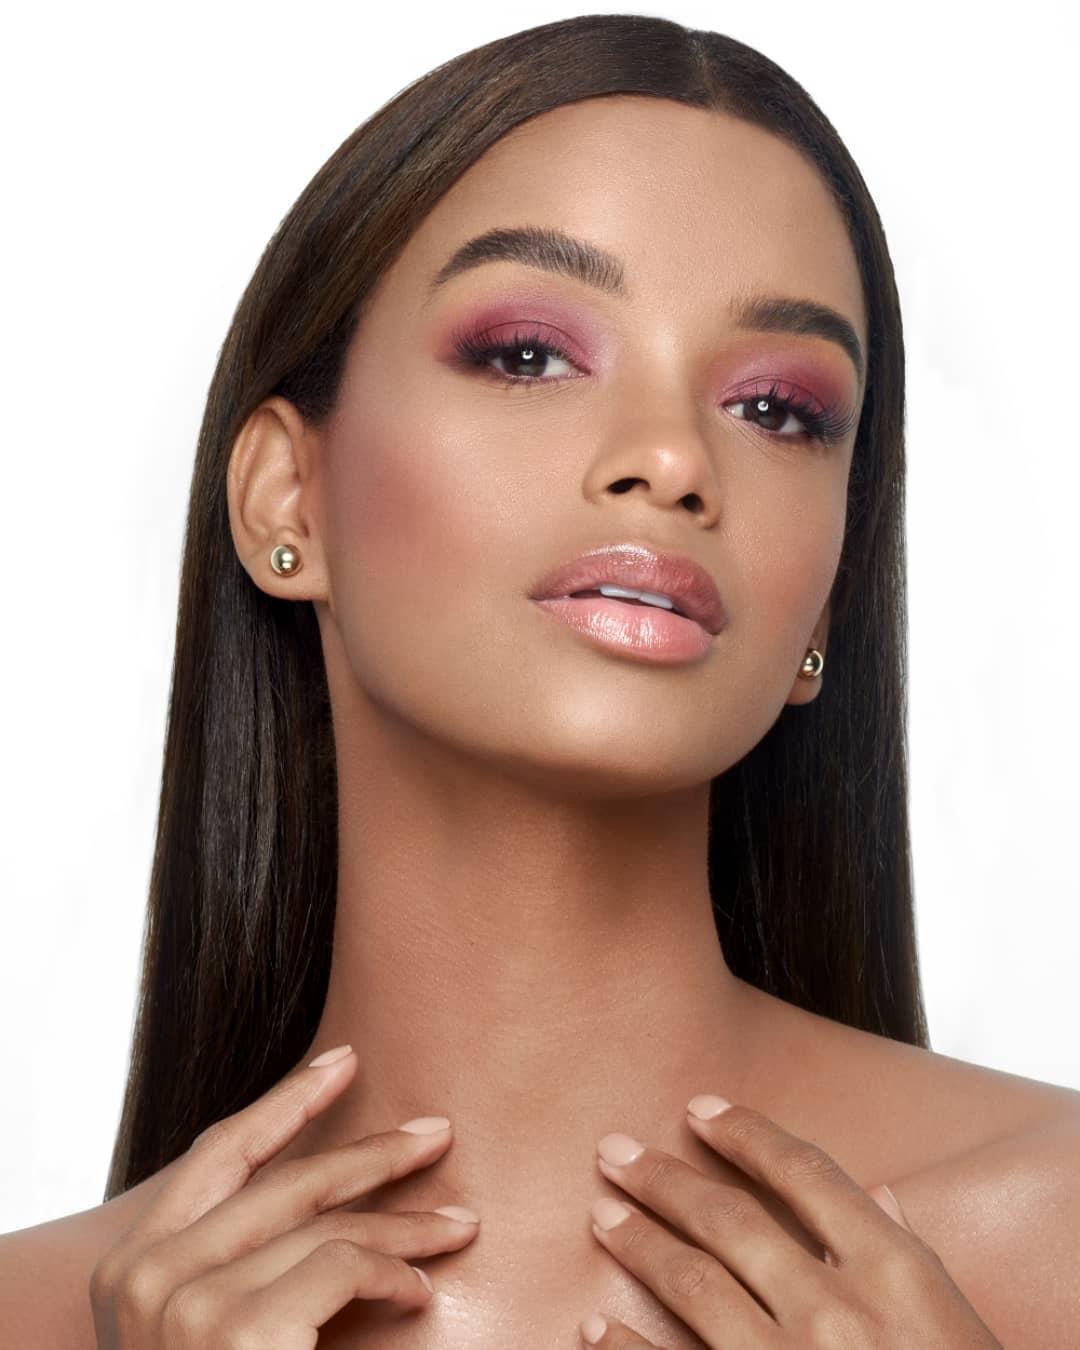 carolina londono, top 16 de miss colombia universo 2020. Carolo20